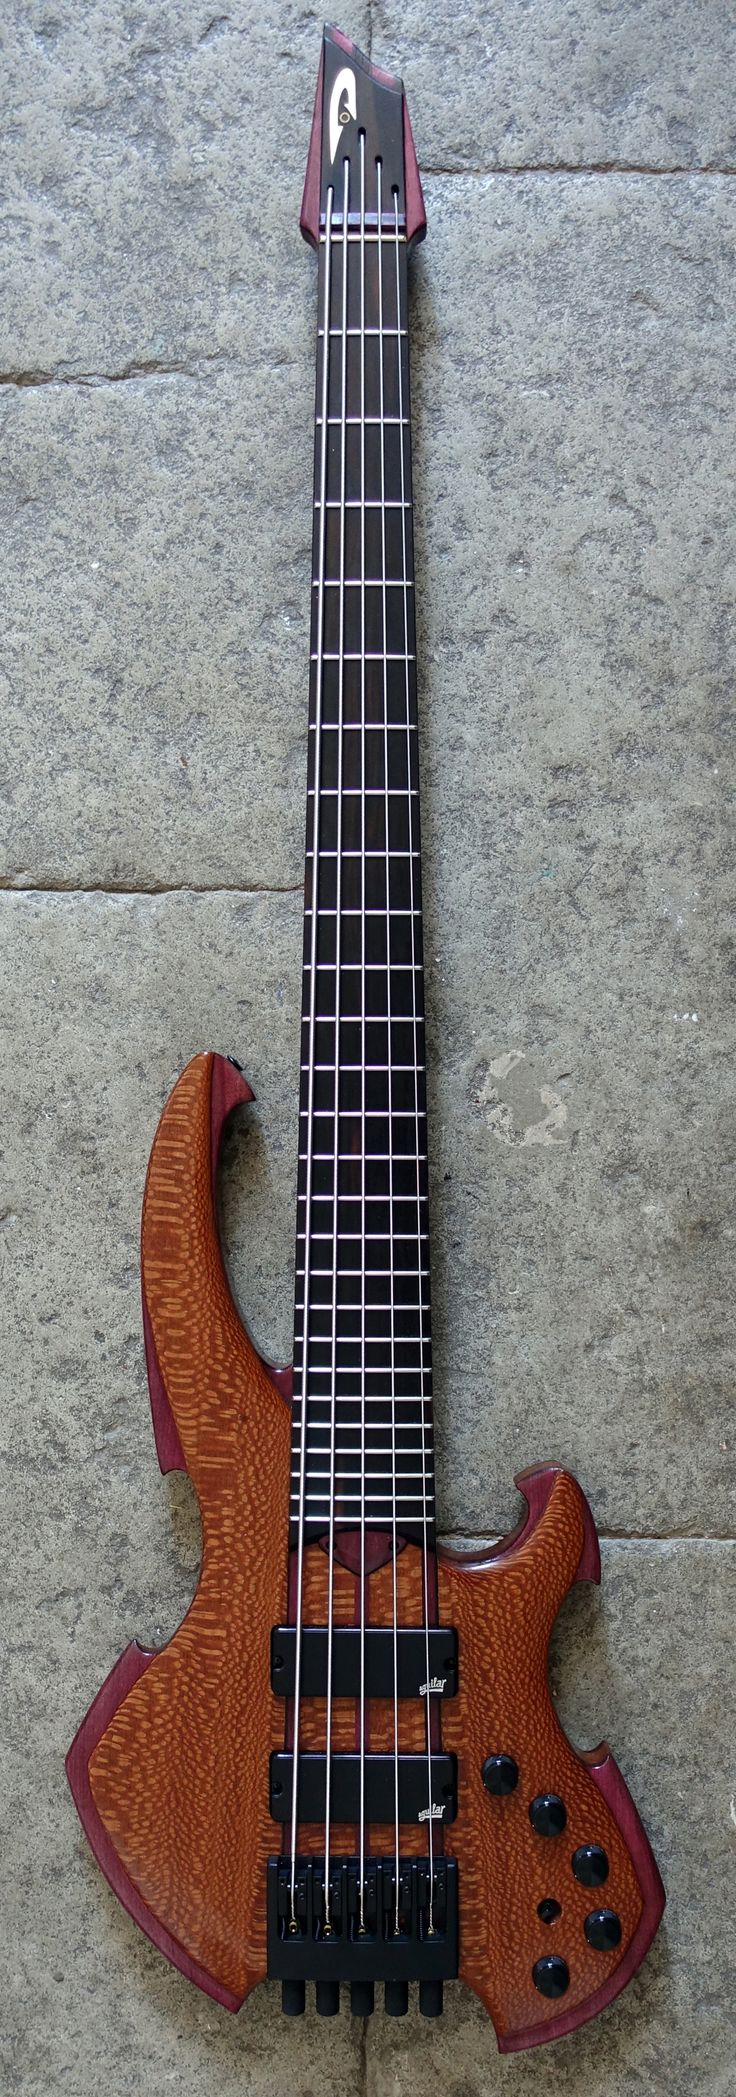 D'ARCO Shakti 5 string bass